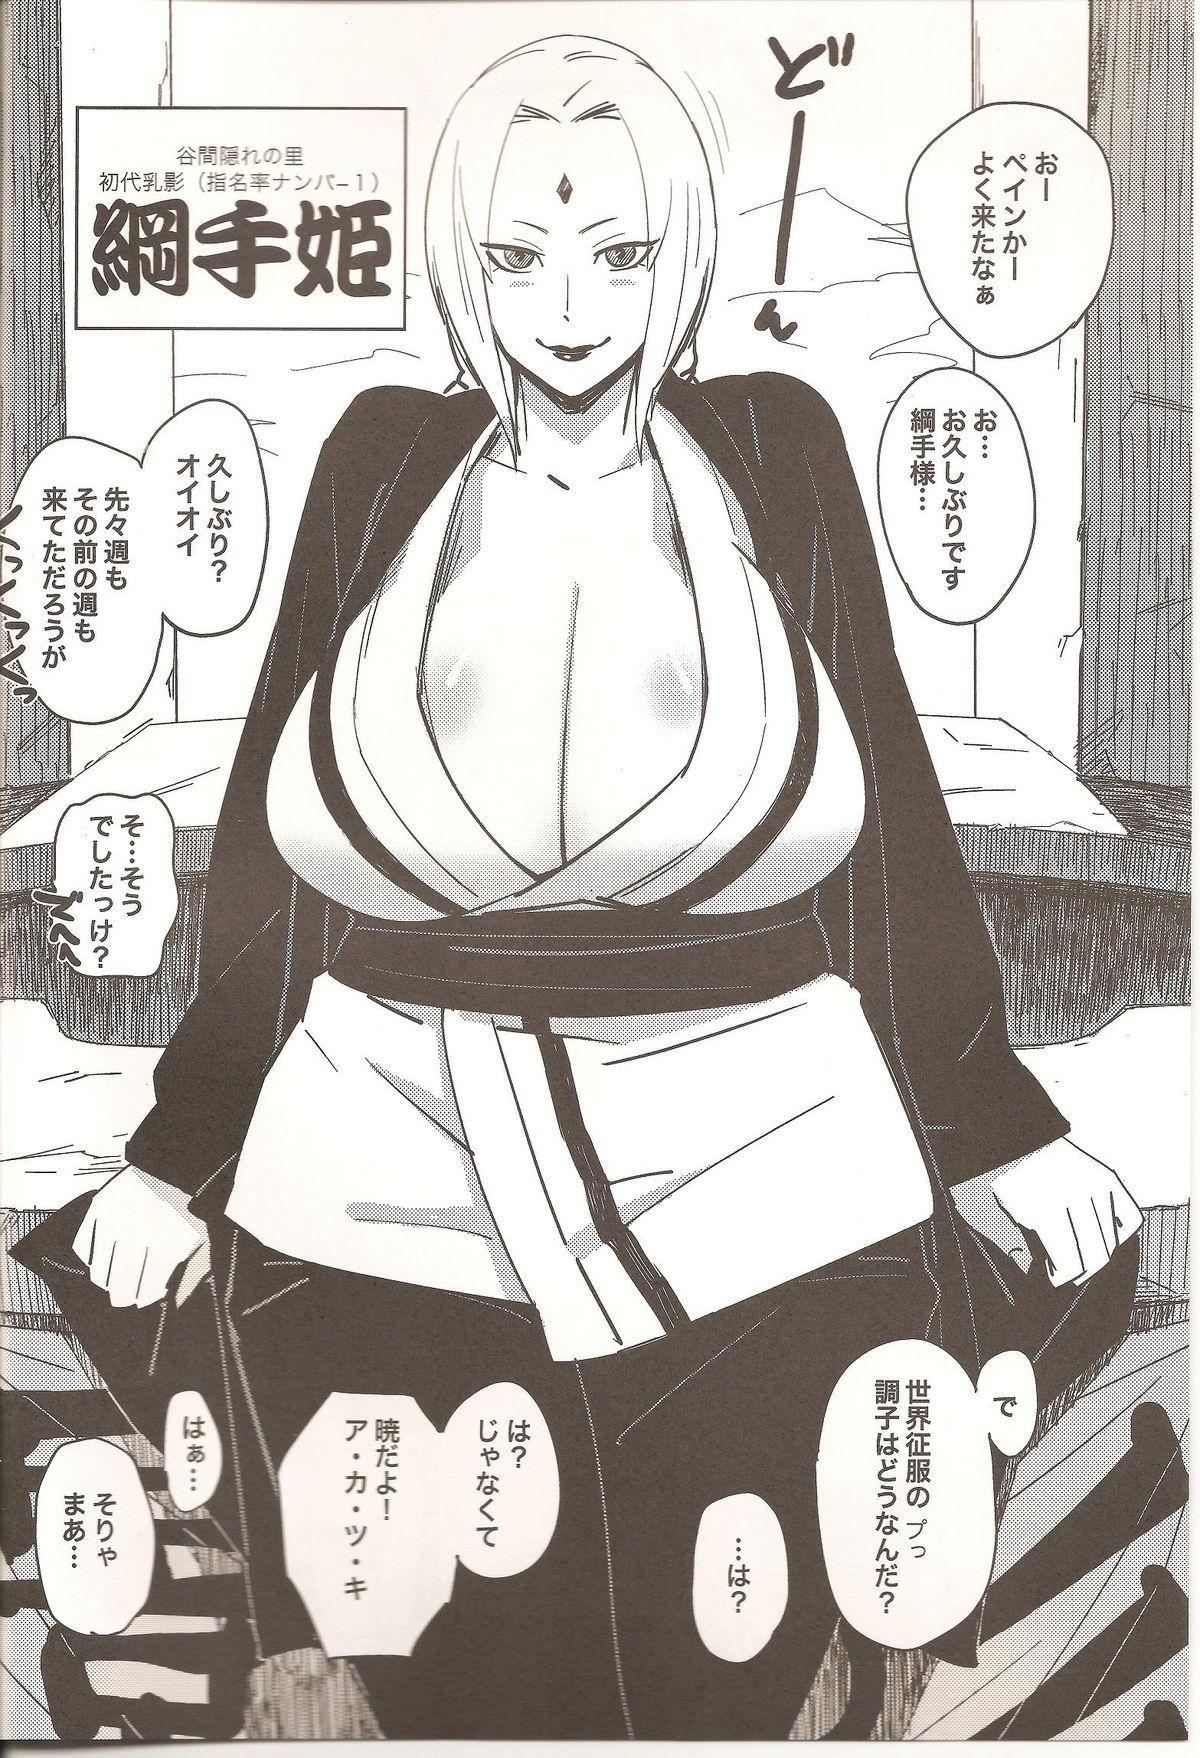 AbRAdEli kAMiTAbA No. 01 Chichikage Hanjouki 2